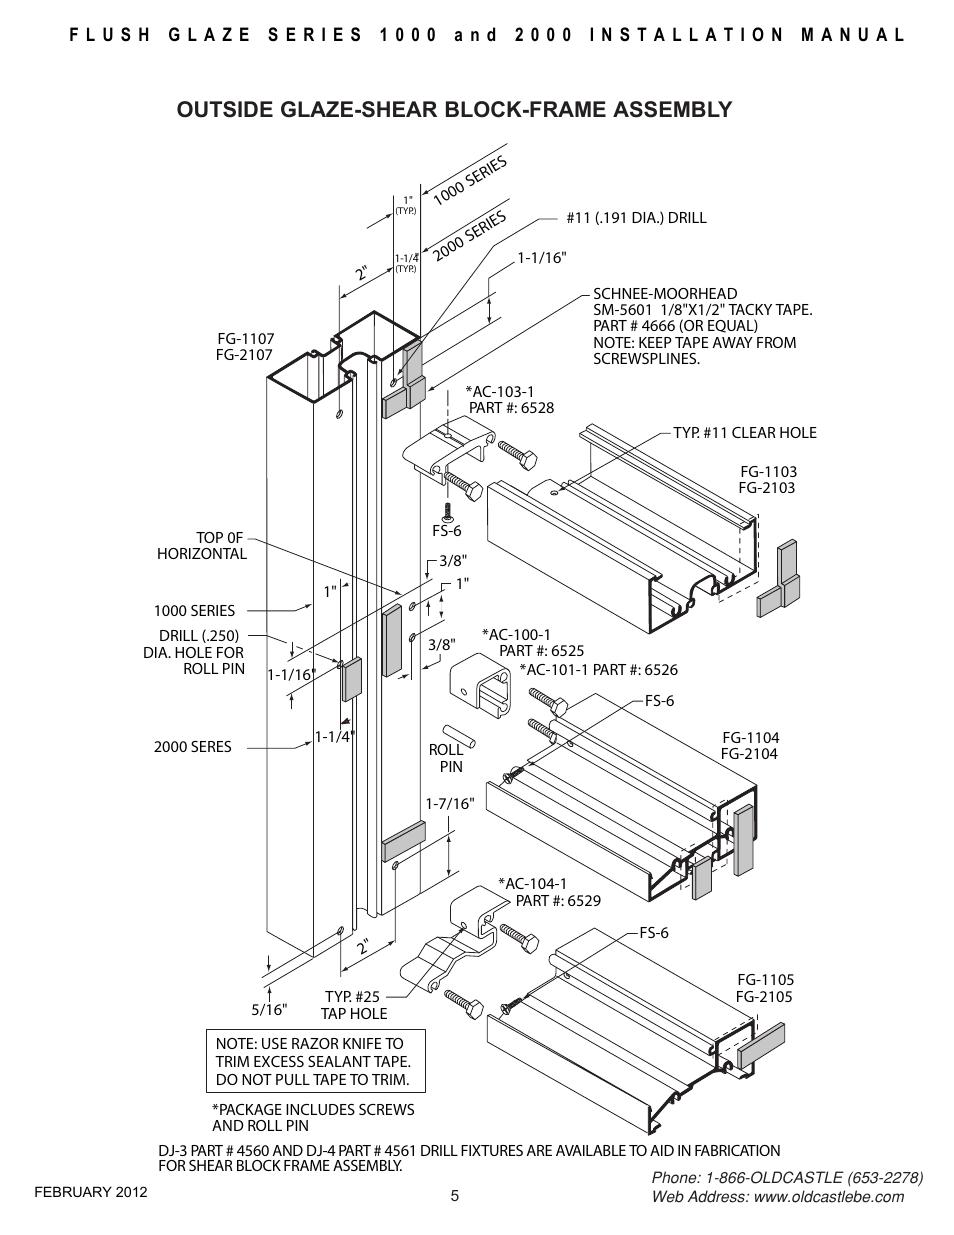 hight resolution of frame assy outside glaze outside glaze shear block frame assembly oldcastle buildingenvelope fg 2000 user manual page 6 27